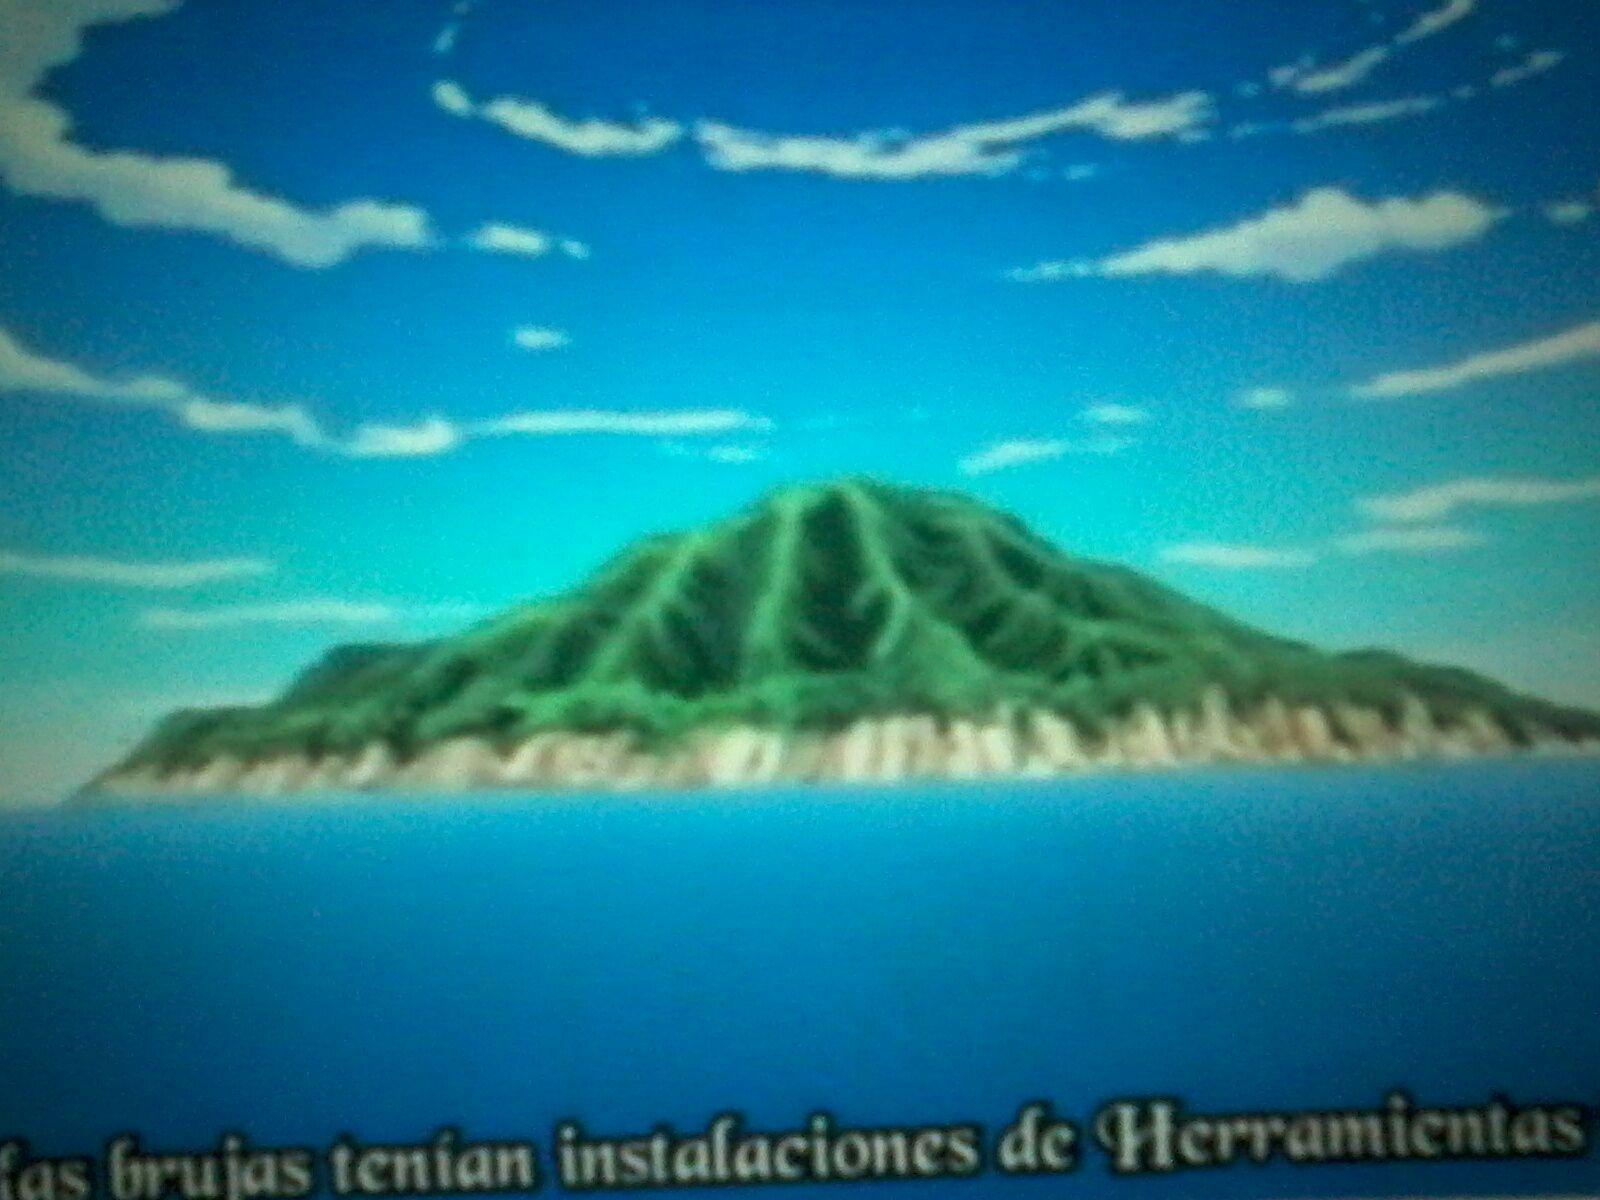 Soul Eater : Papel De Luna (Soul Y Tu) - capítulo 33 : La ...